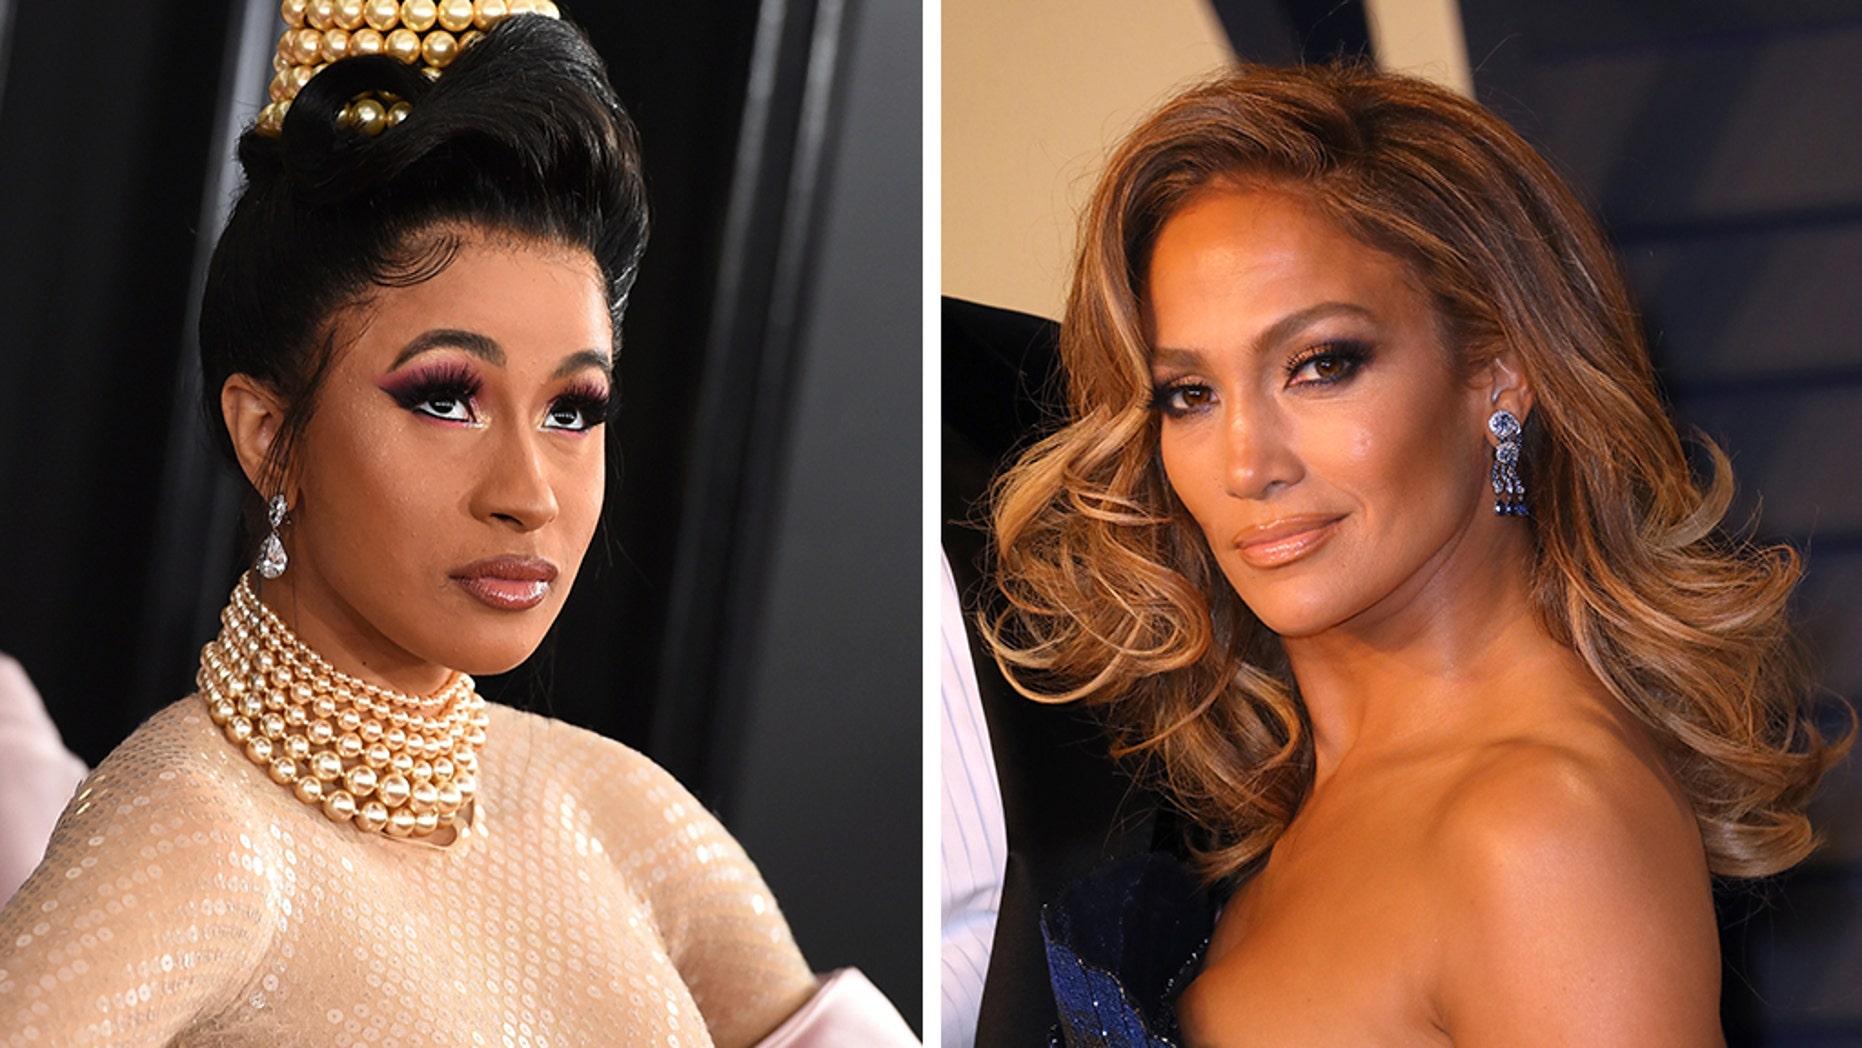 Cardi B is reportedly set to make her underline film entrance as a stripper alongside Jennifer Lopez in a arriving film Hustlers.